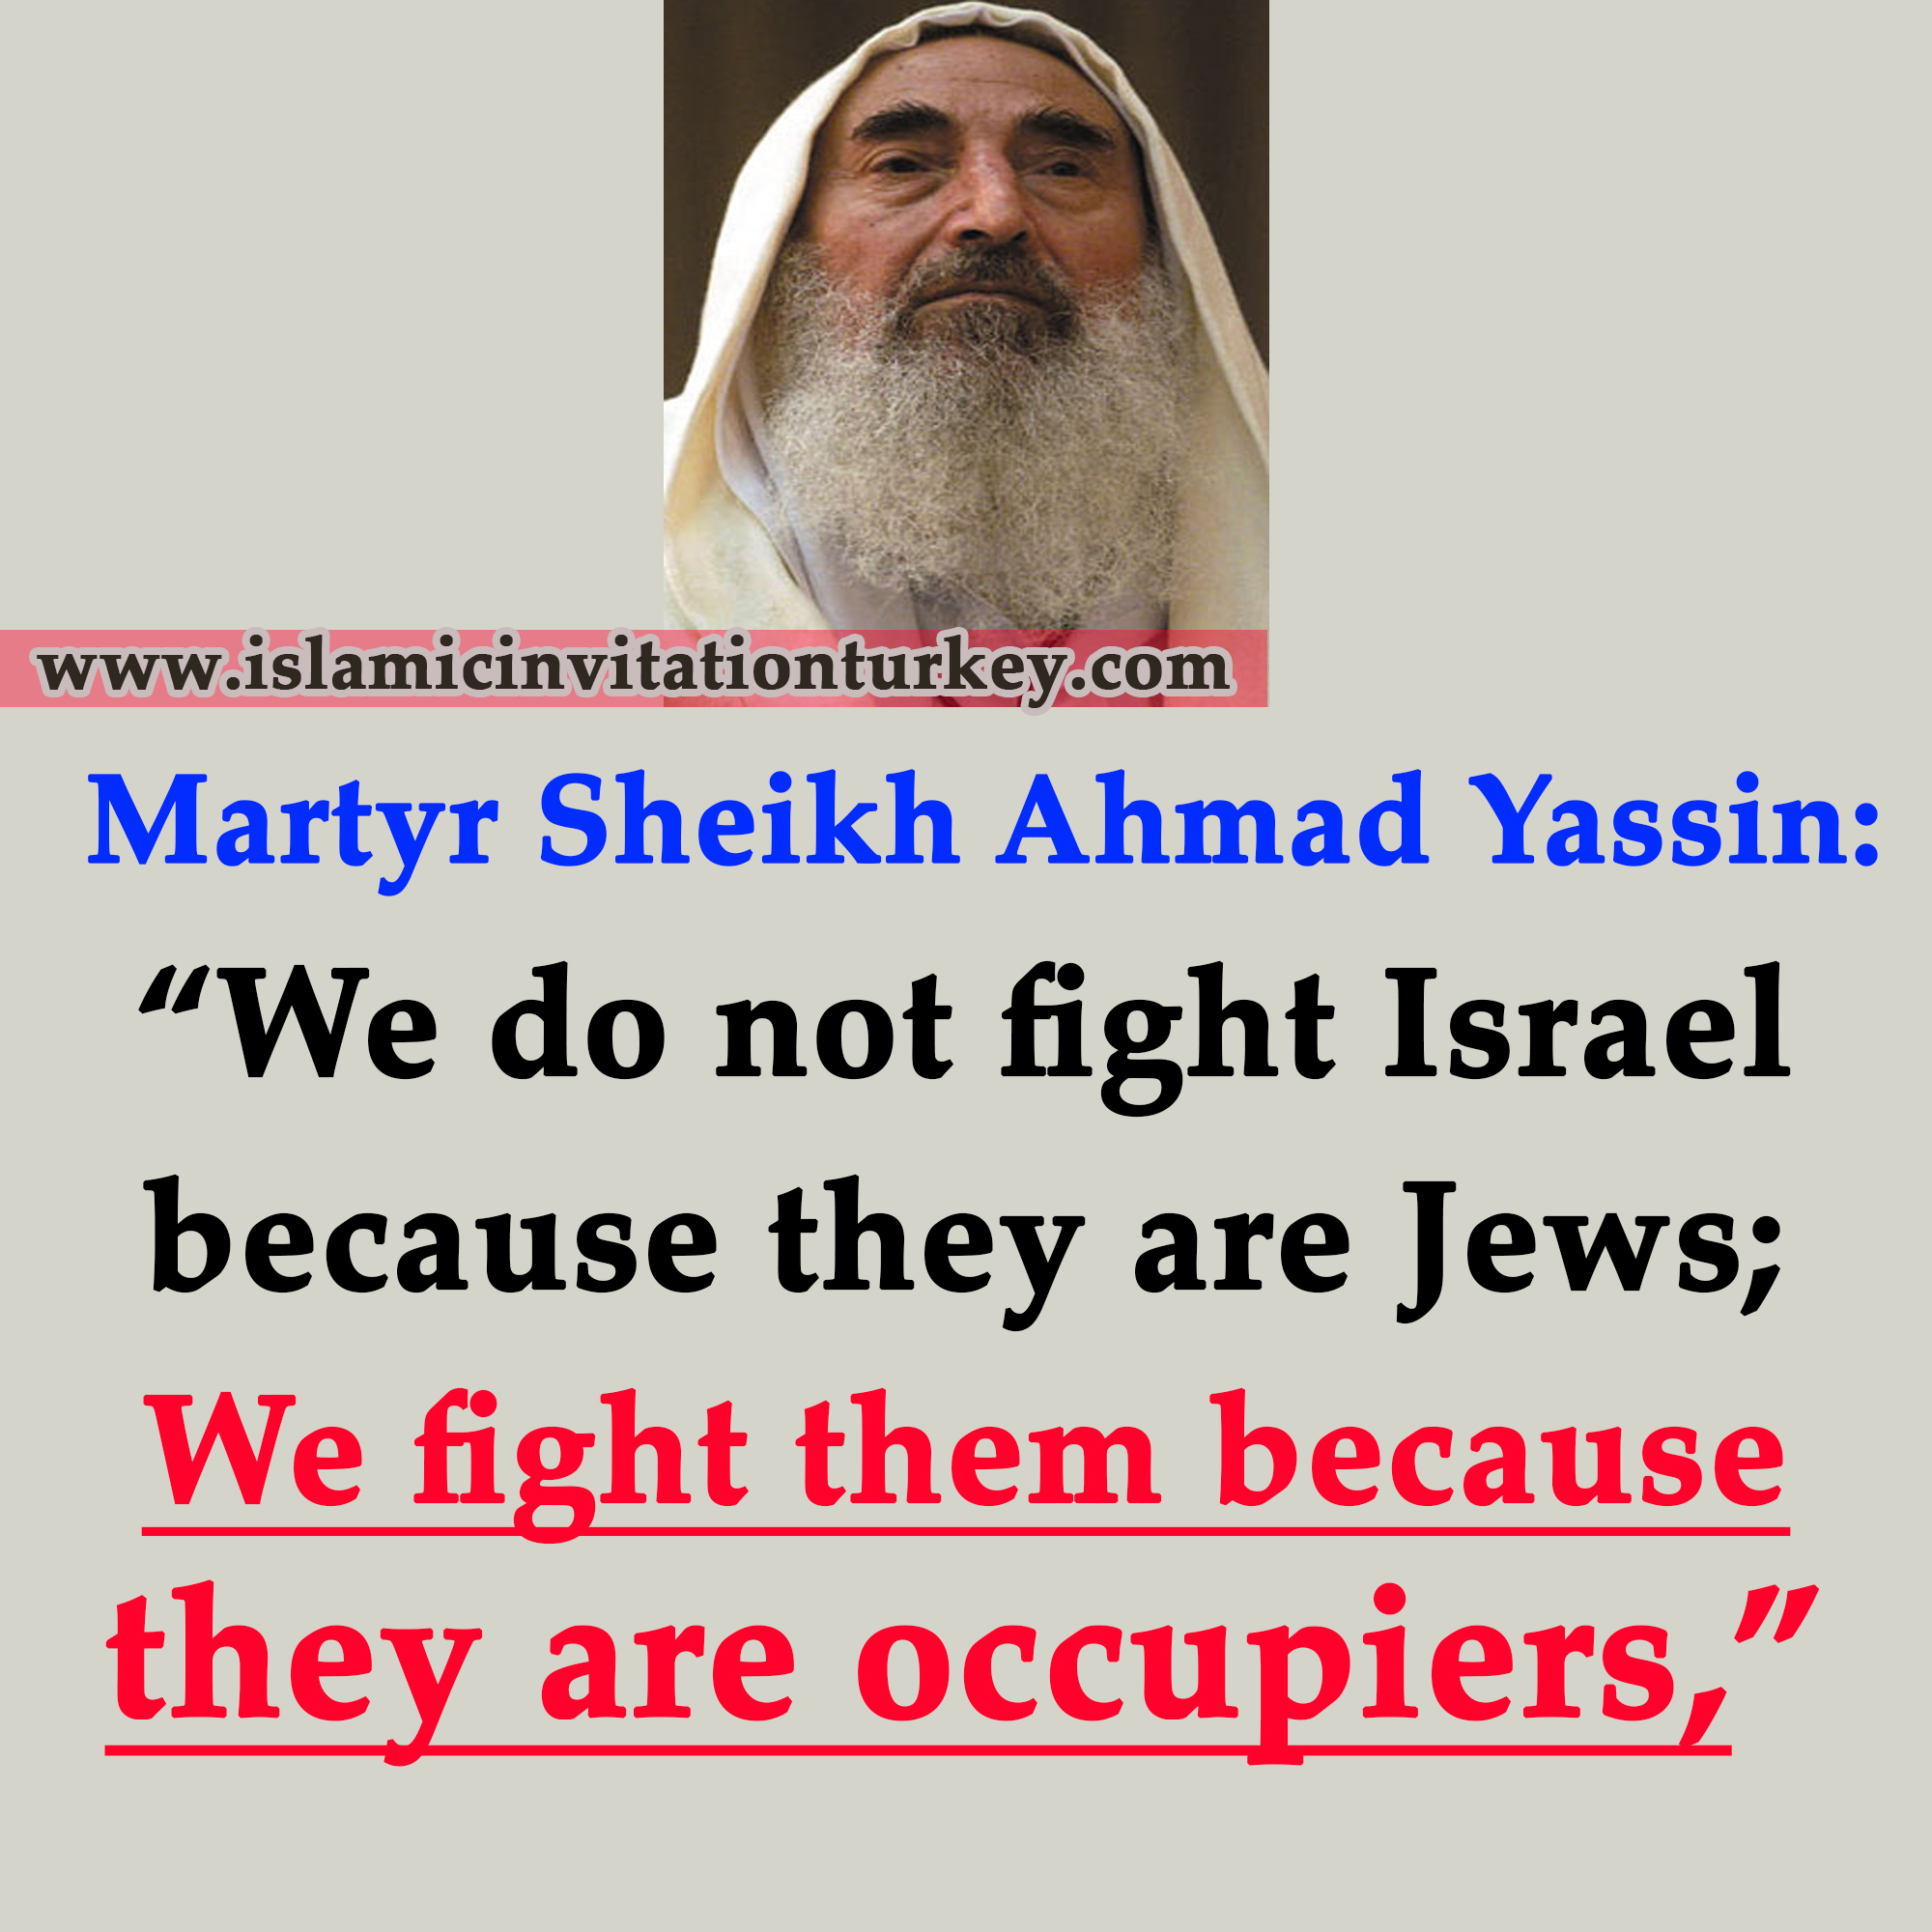 martyra ahmad yassin